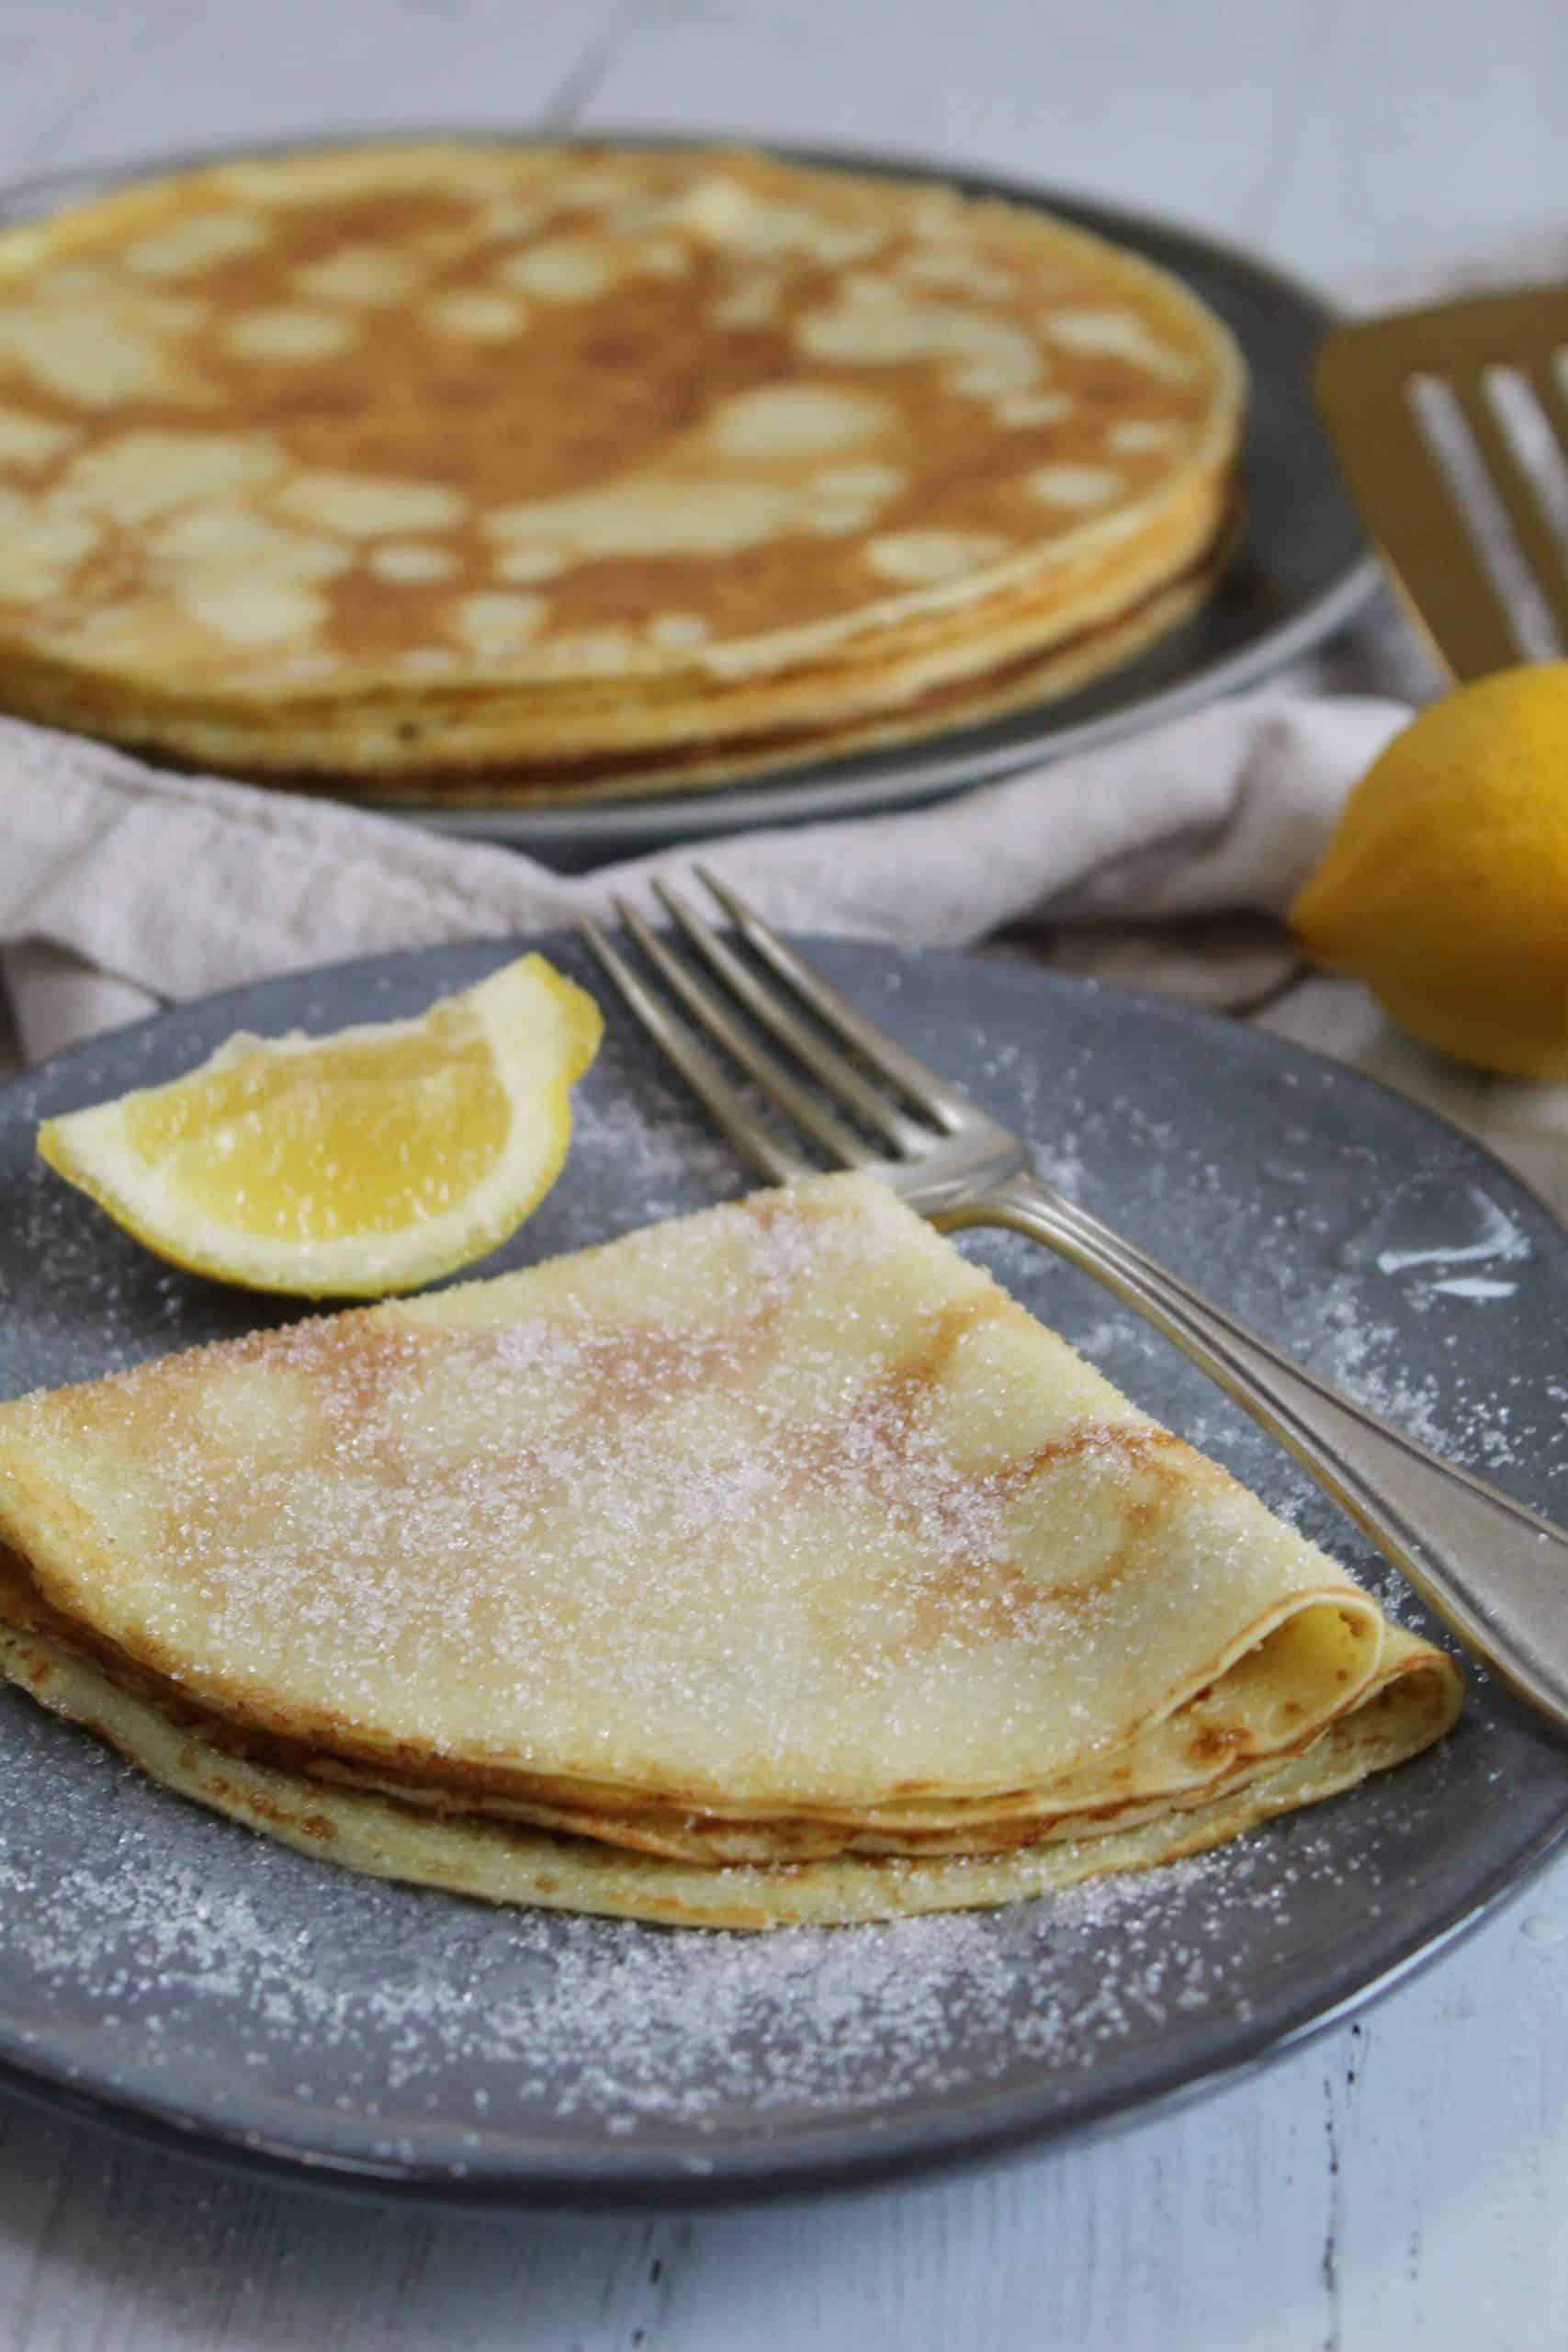 gluten free pancake recipe easy crepe style 8